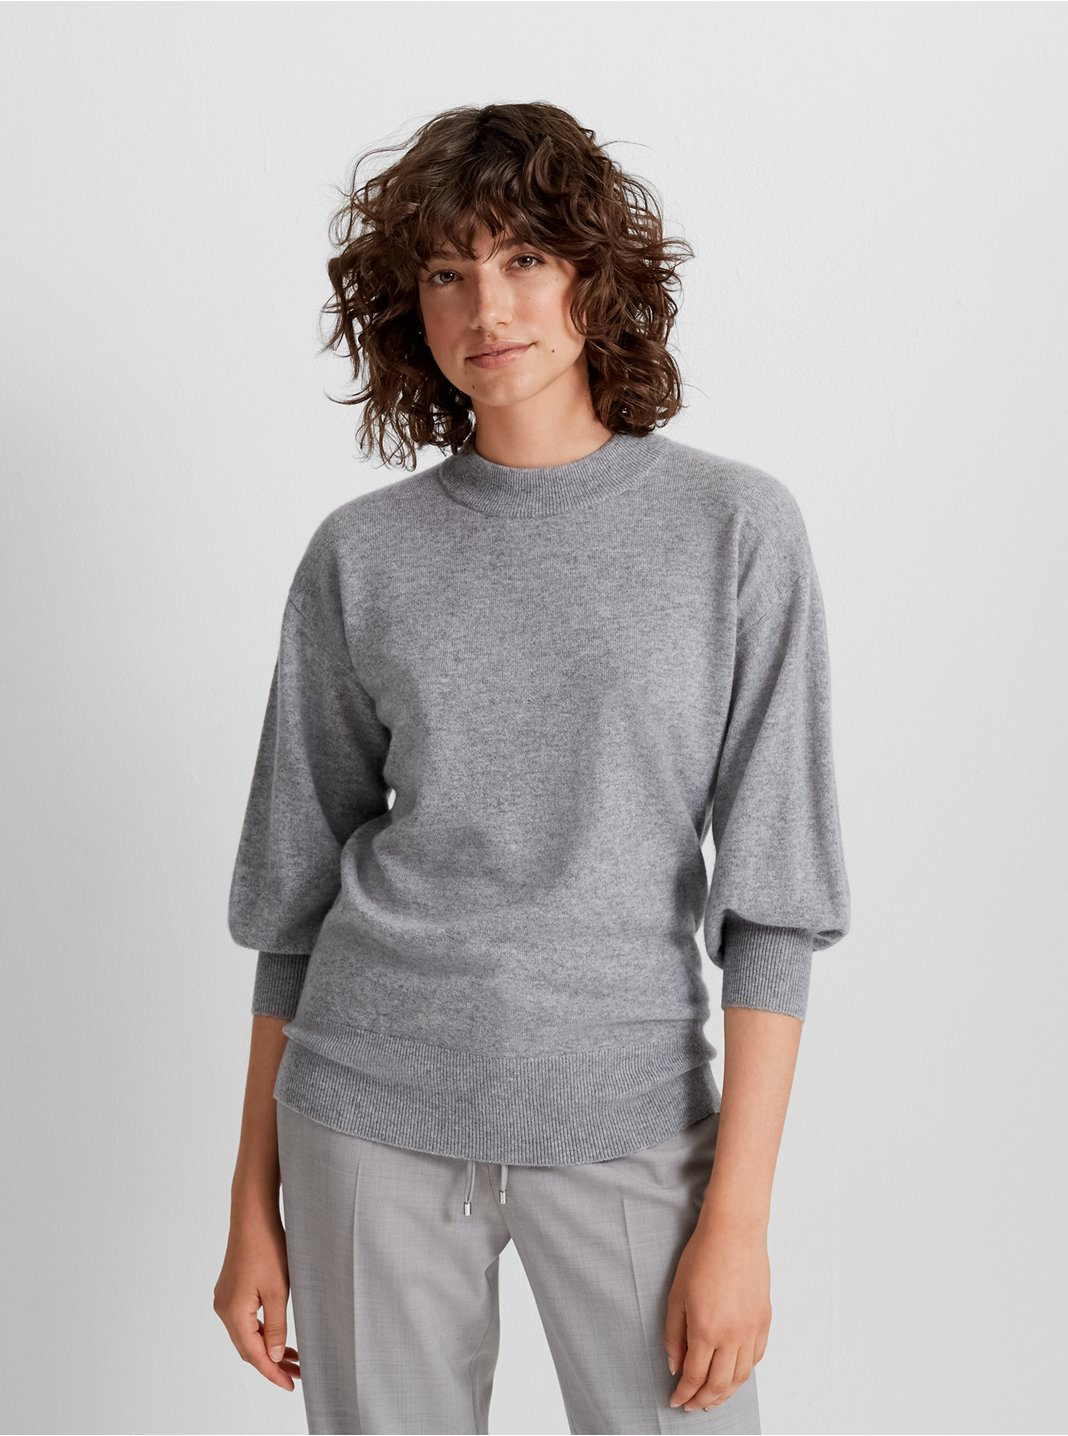 Elima Cashmere Sweater